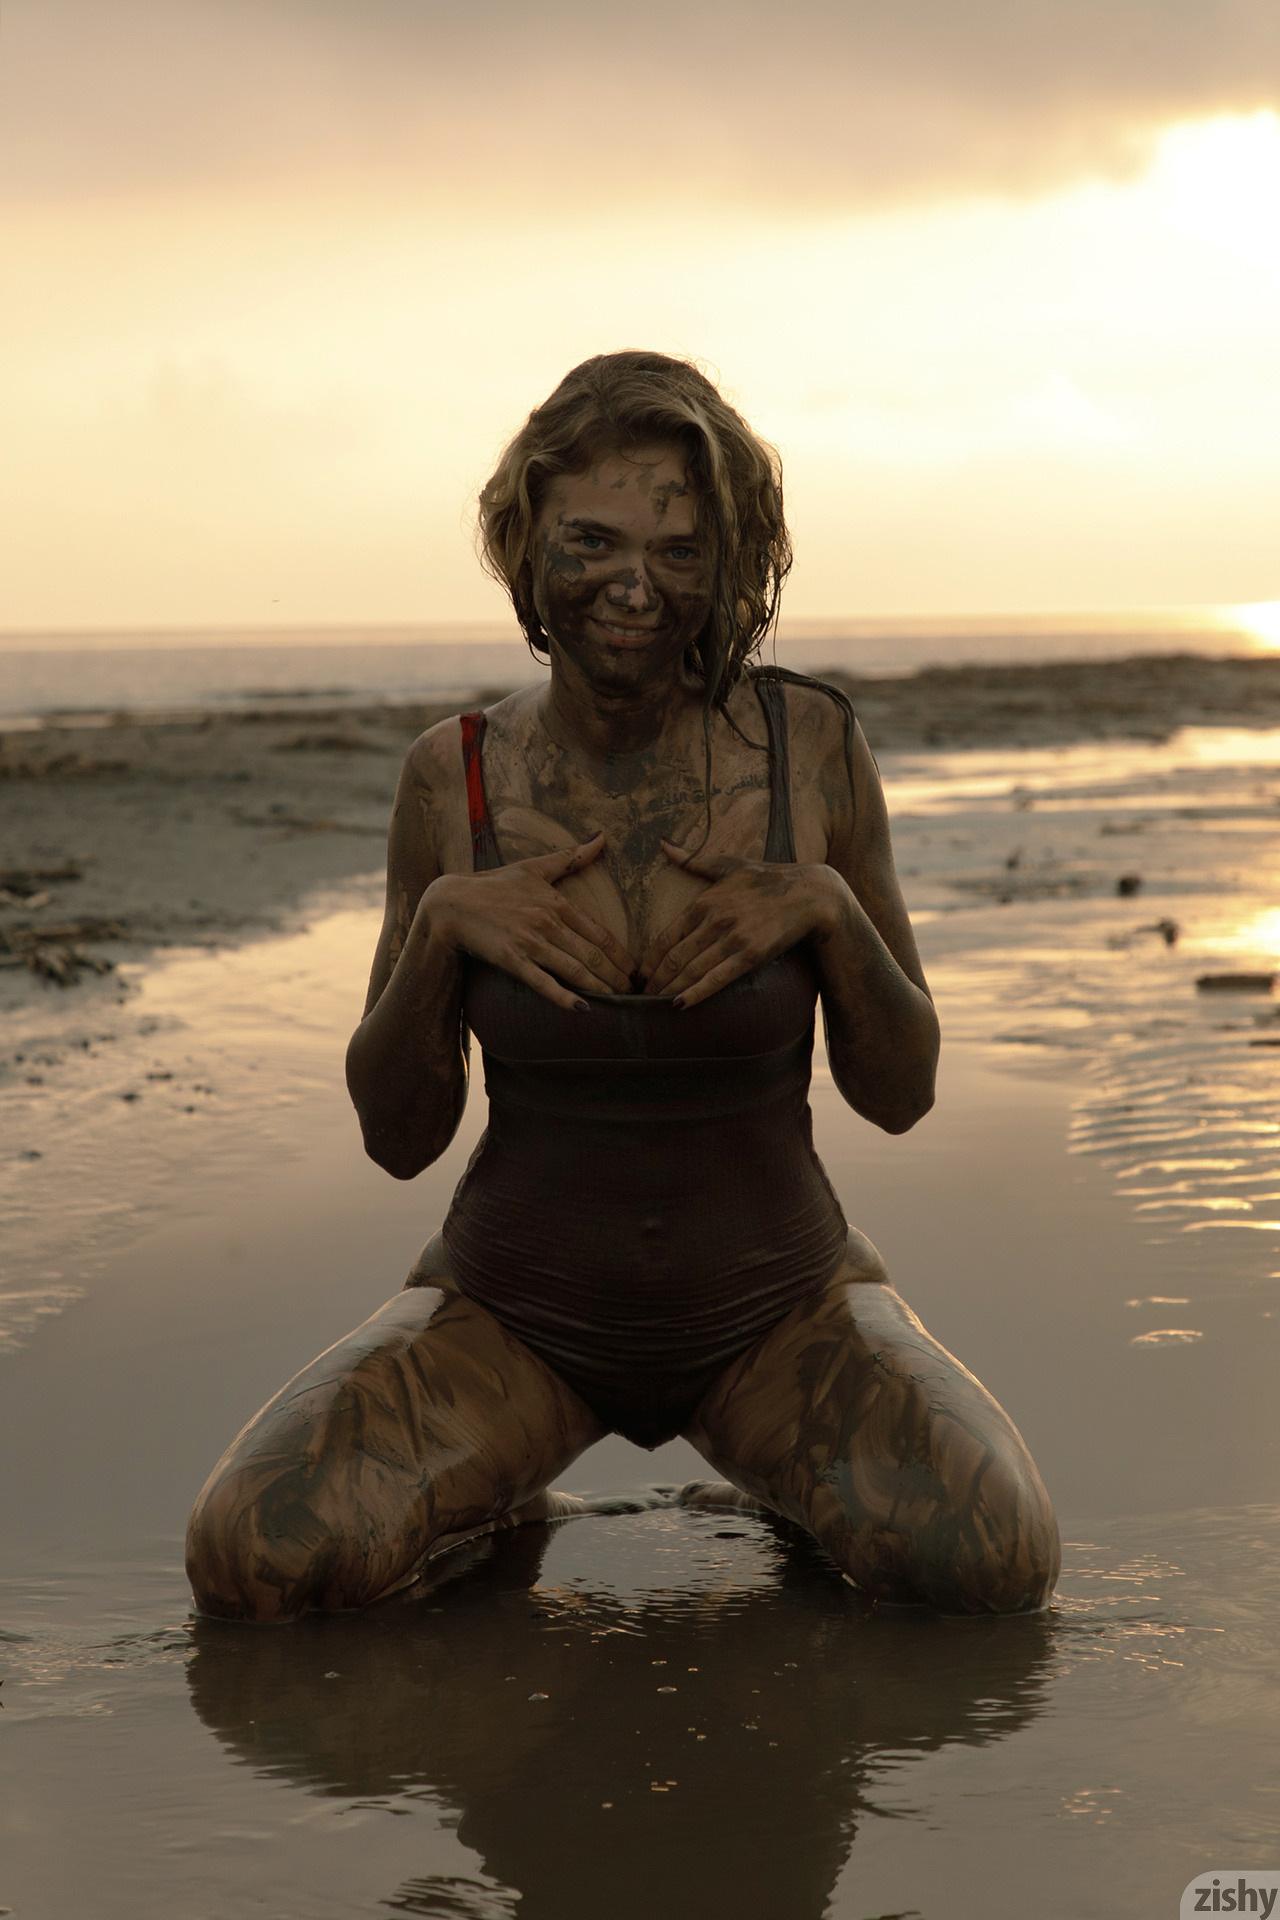 Sofia Orlova On Gryaznyy Beach Zishy (54)